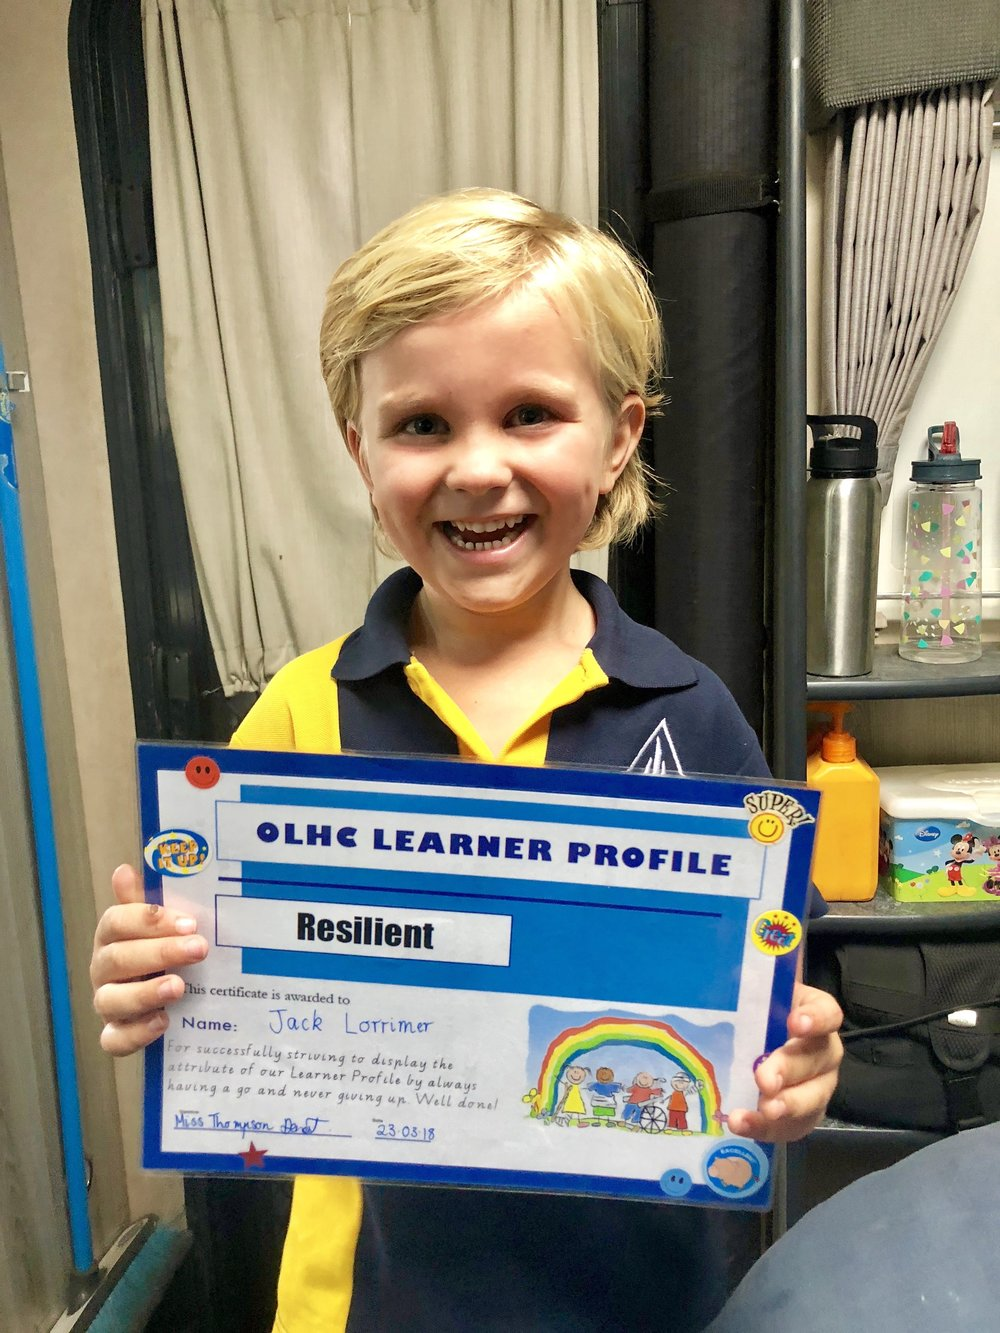 School Award, so proud.